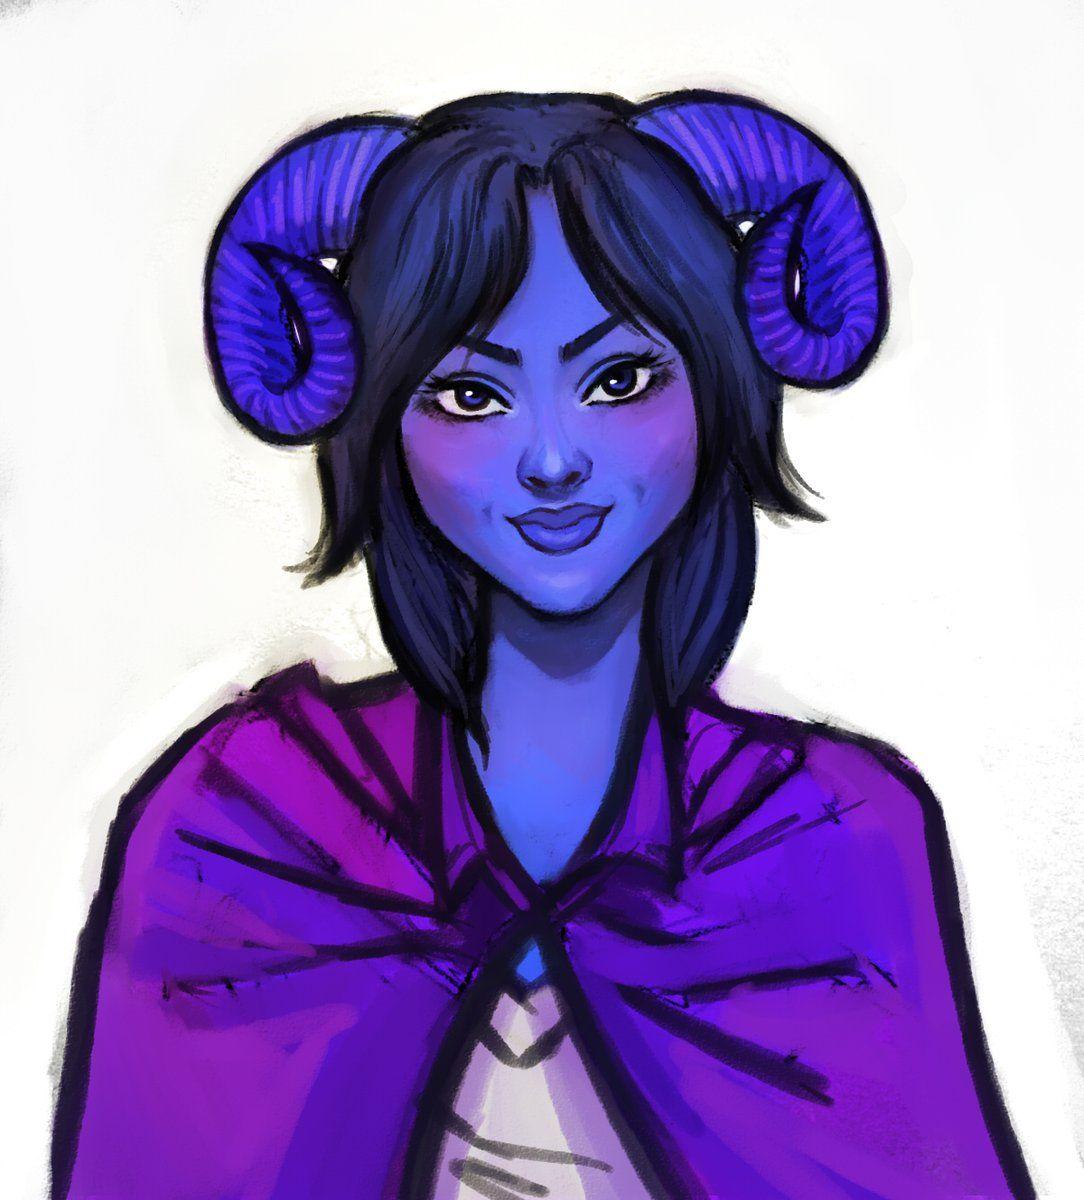 A Blue Tiefling Girl With A Purple Cape Critical Role Fanart